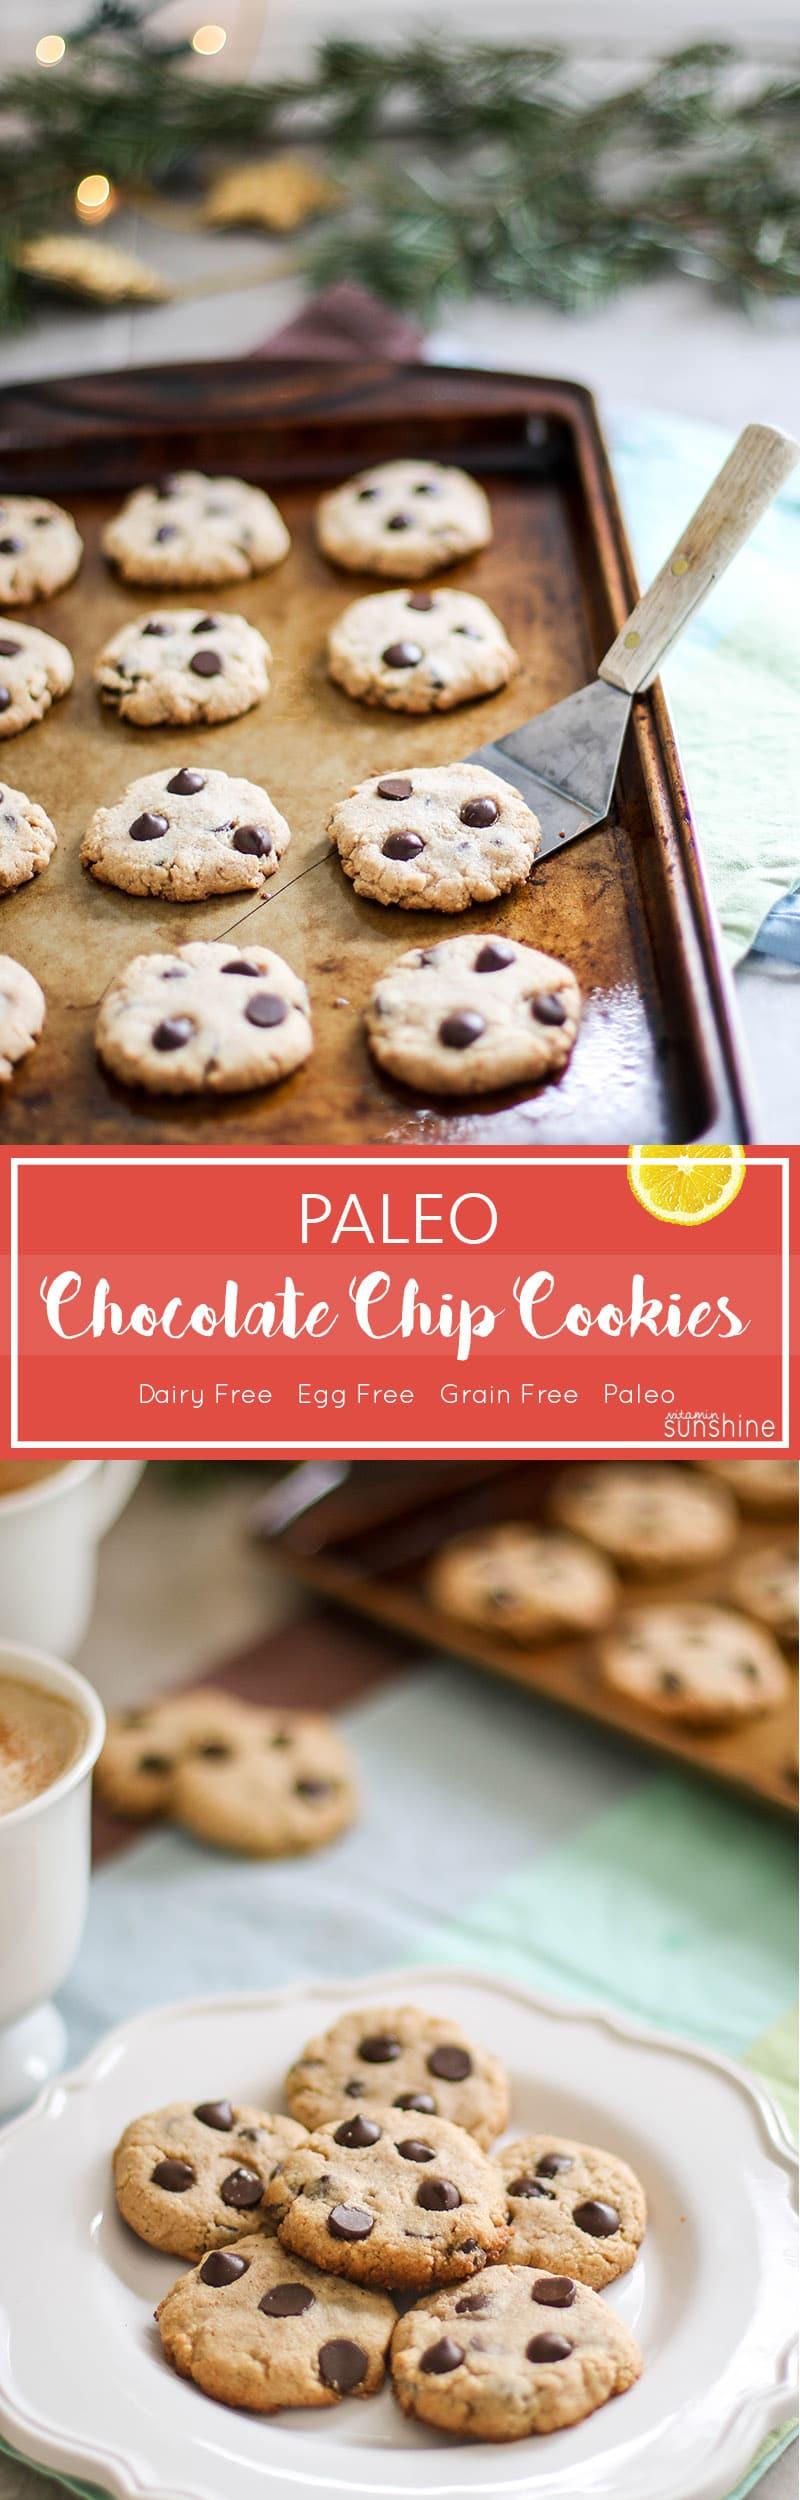 Paleo Chocolate Chip Cookies (5 Ingredients!) - Vitamin Sunshine